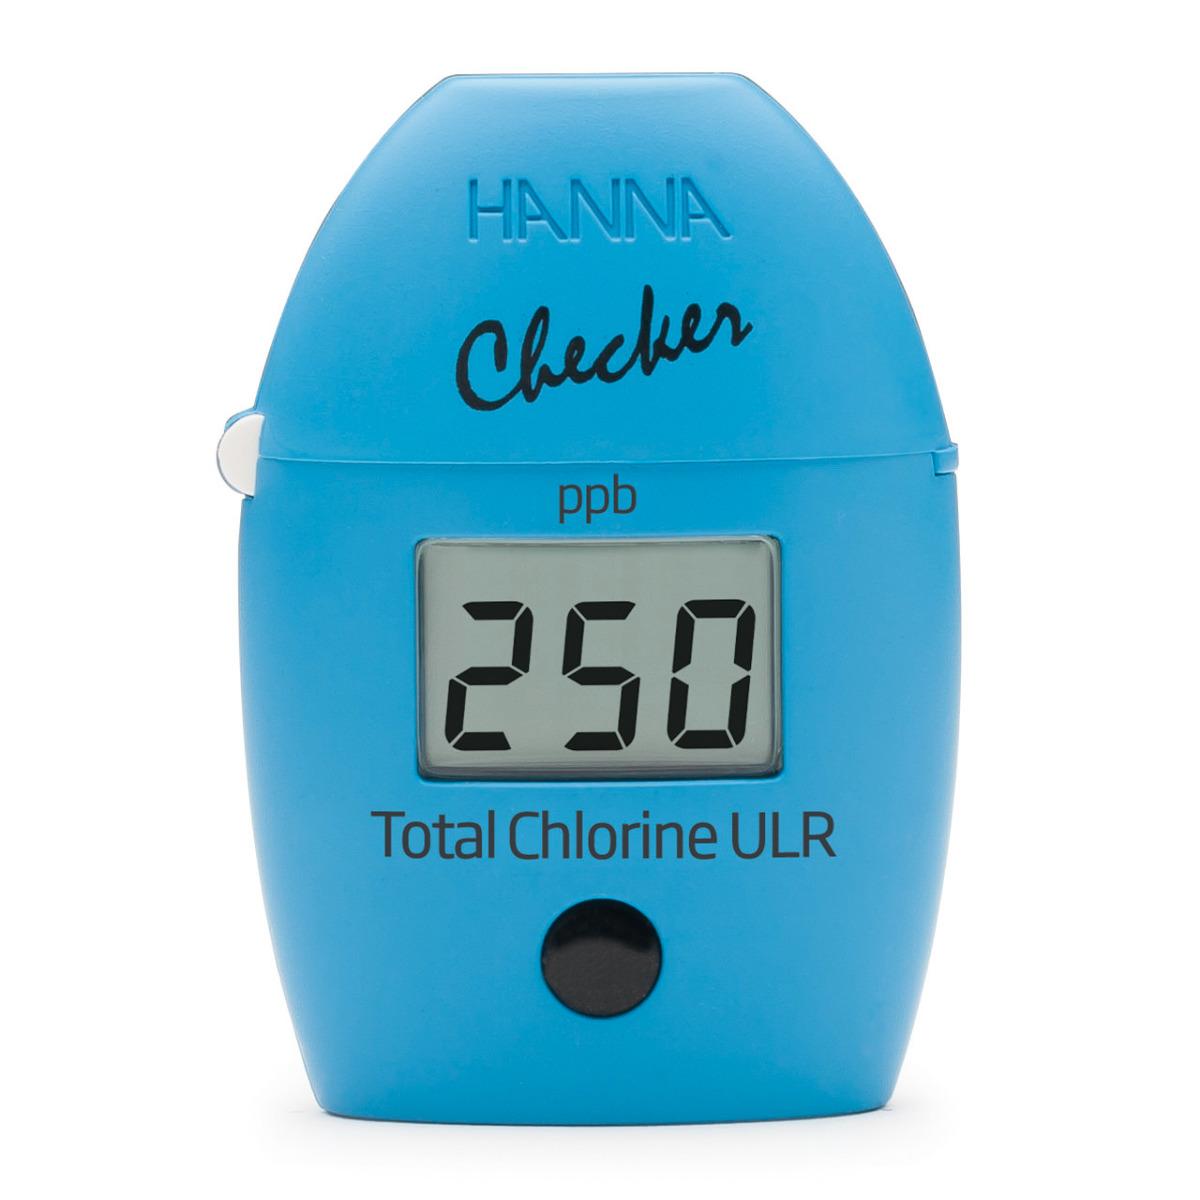 Total Chlorine Ultra Low Range Checker® HC - HI761